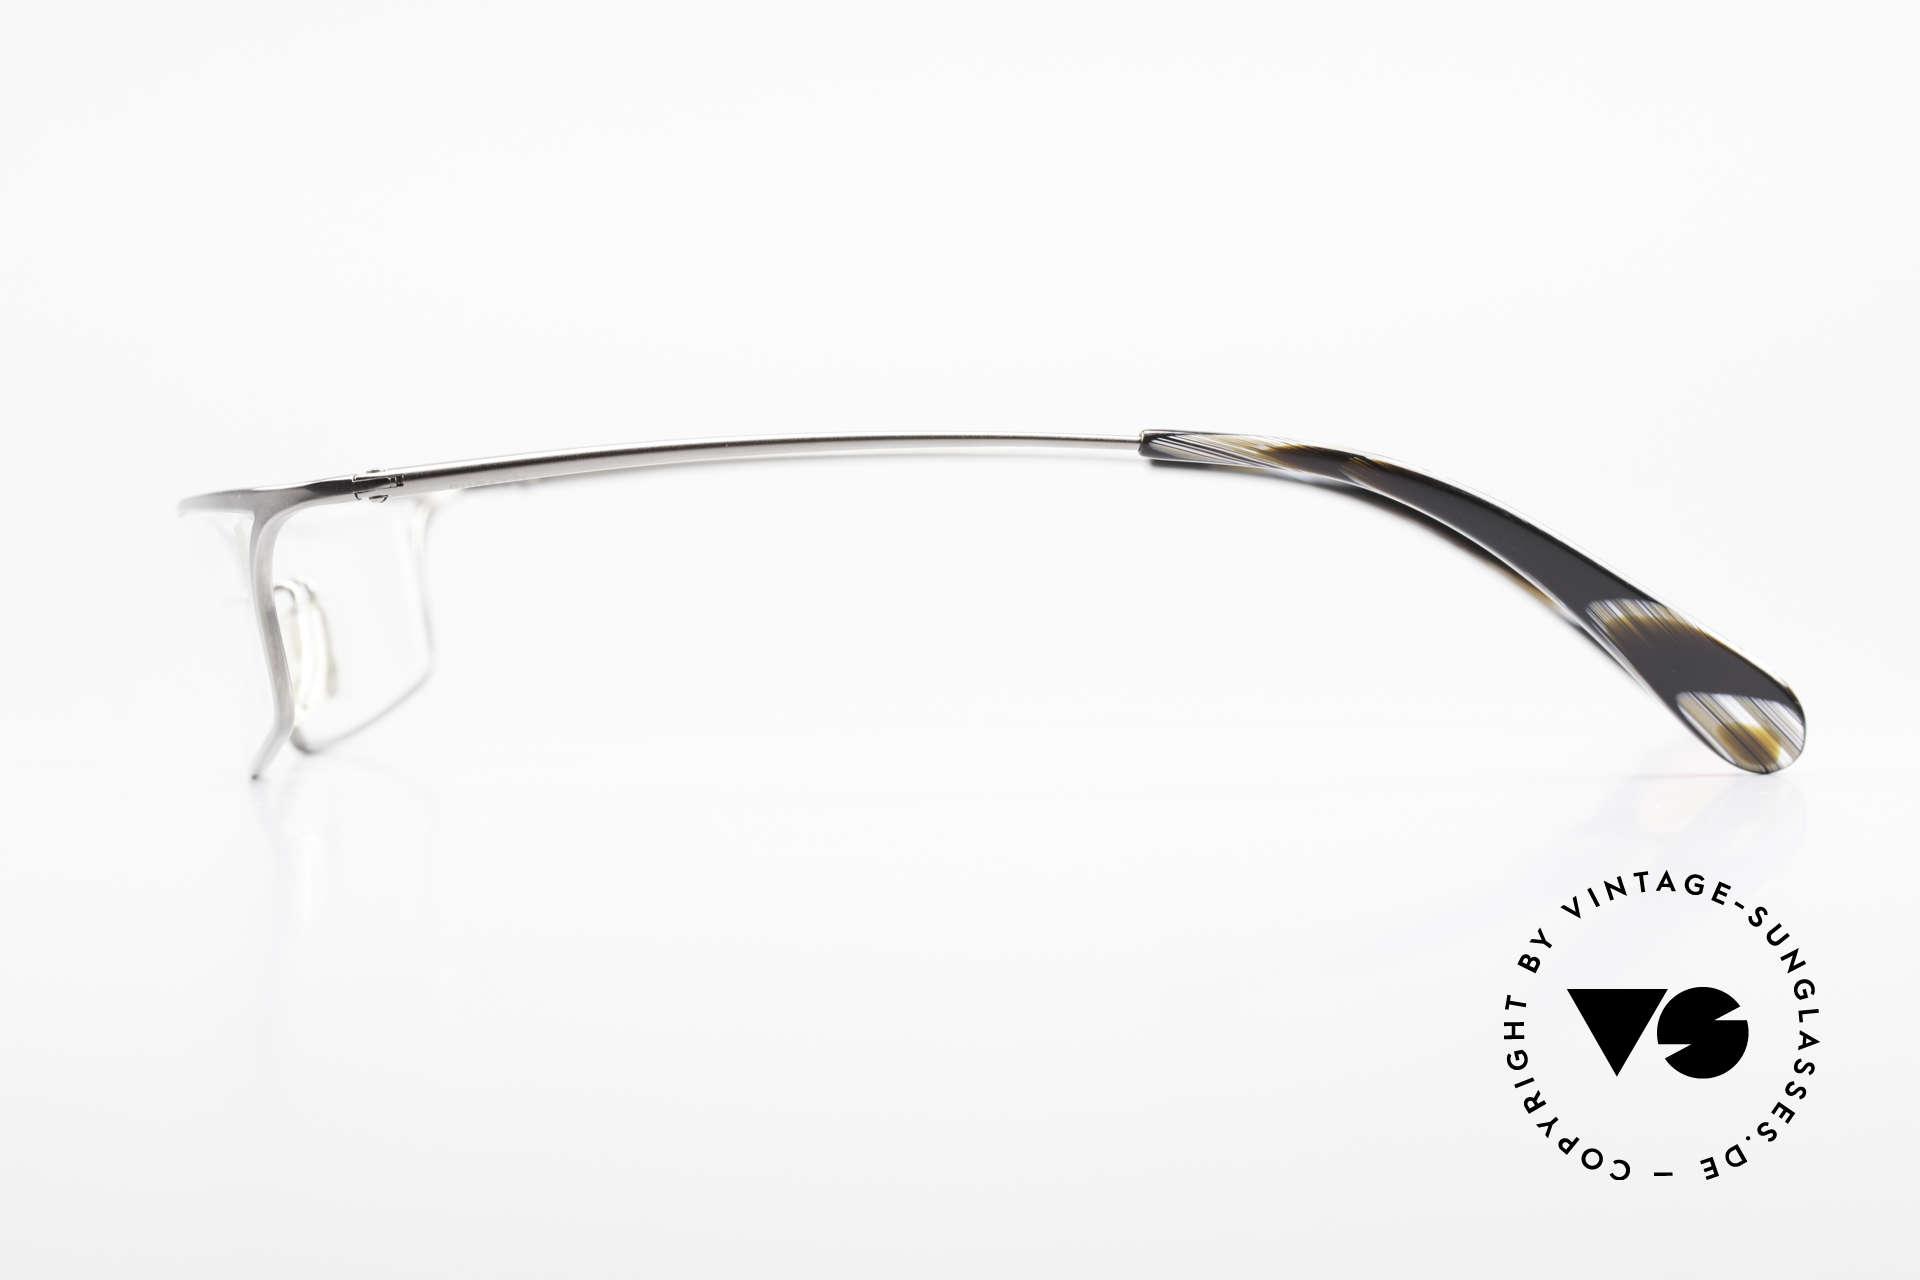 Bugatti 352 Odotype Striking Men's Designer Frame, very special lens construction; TOP comfort, Made for Men